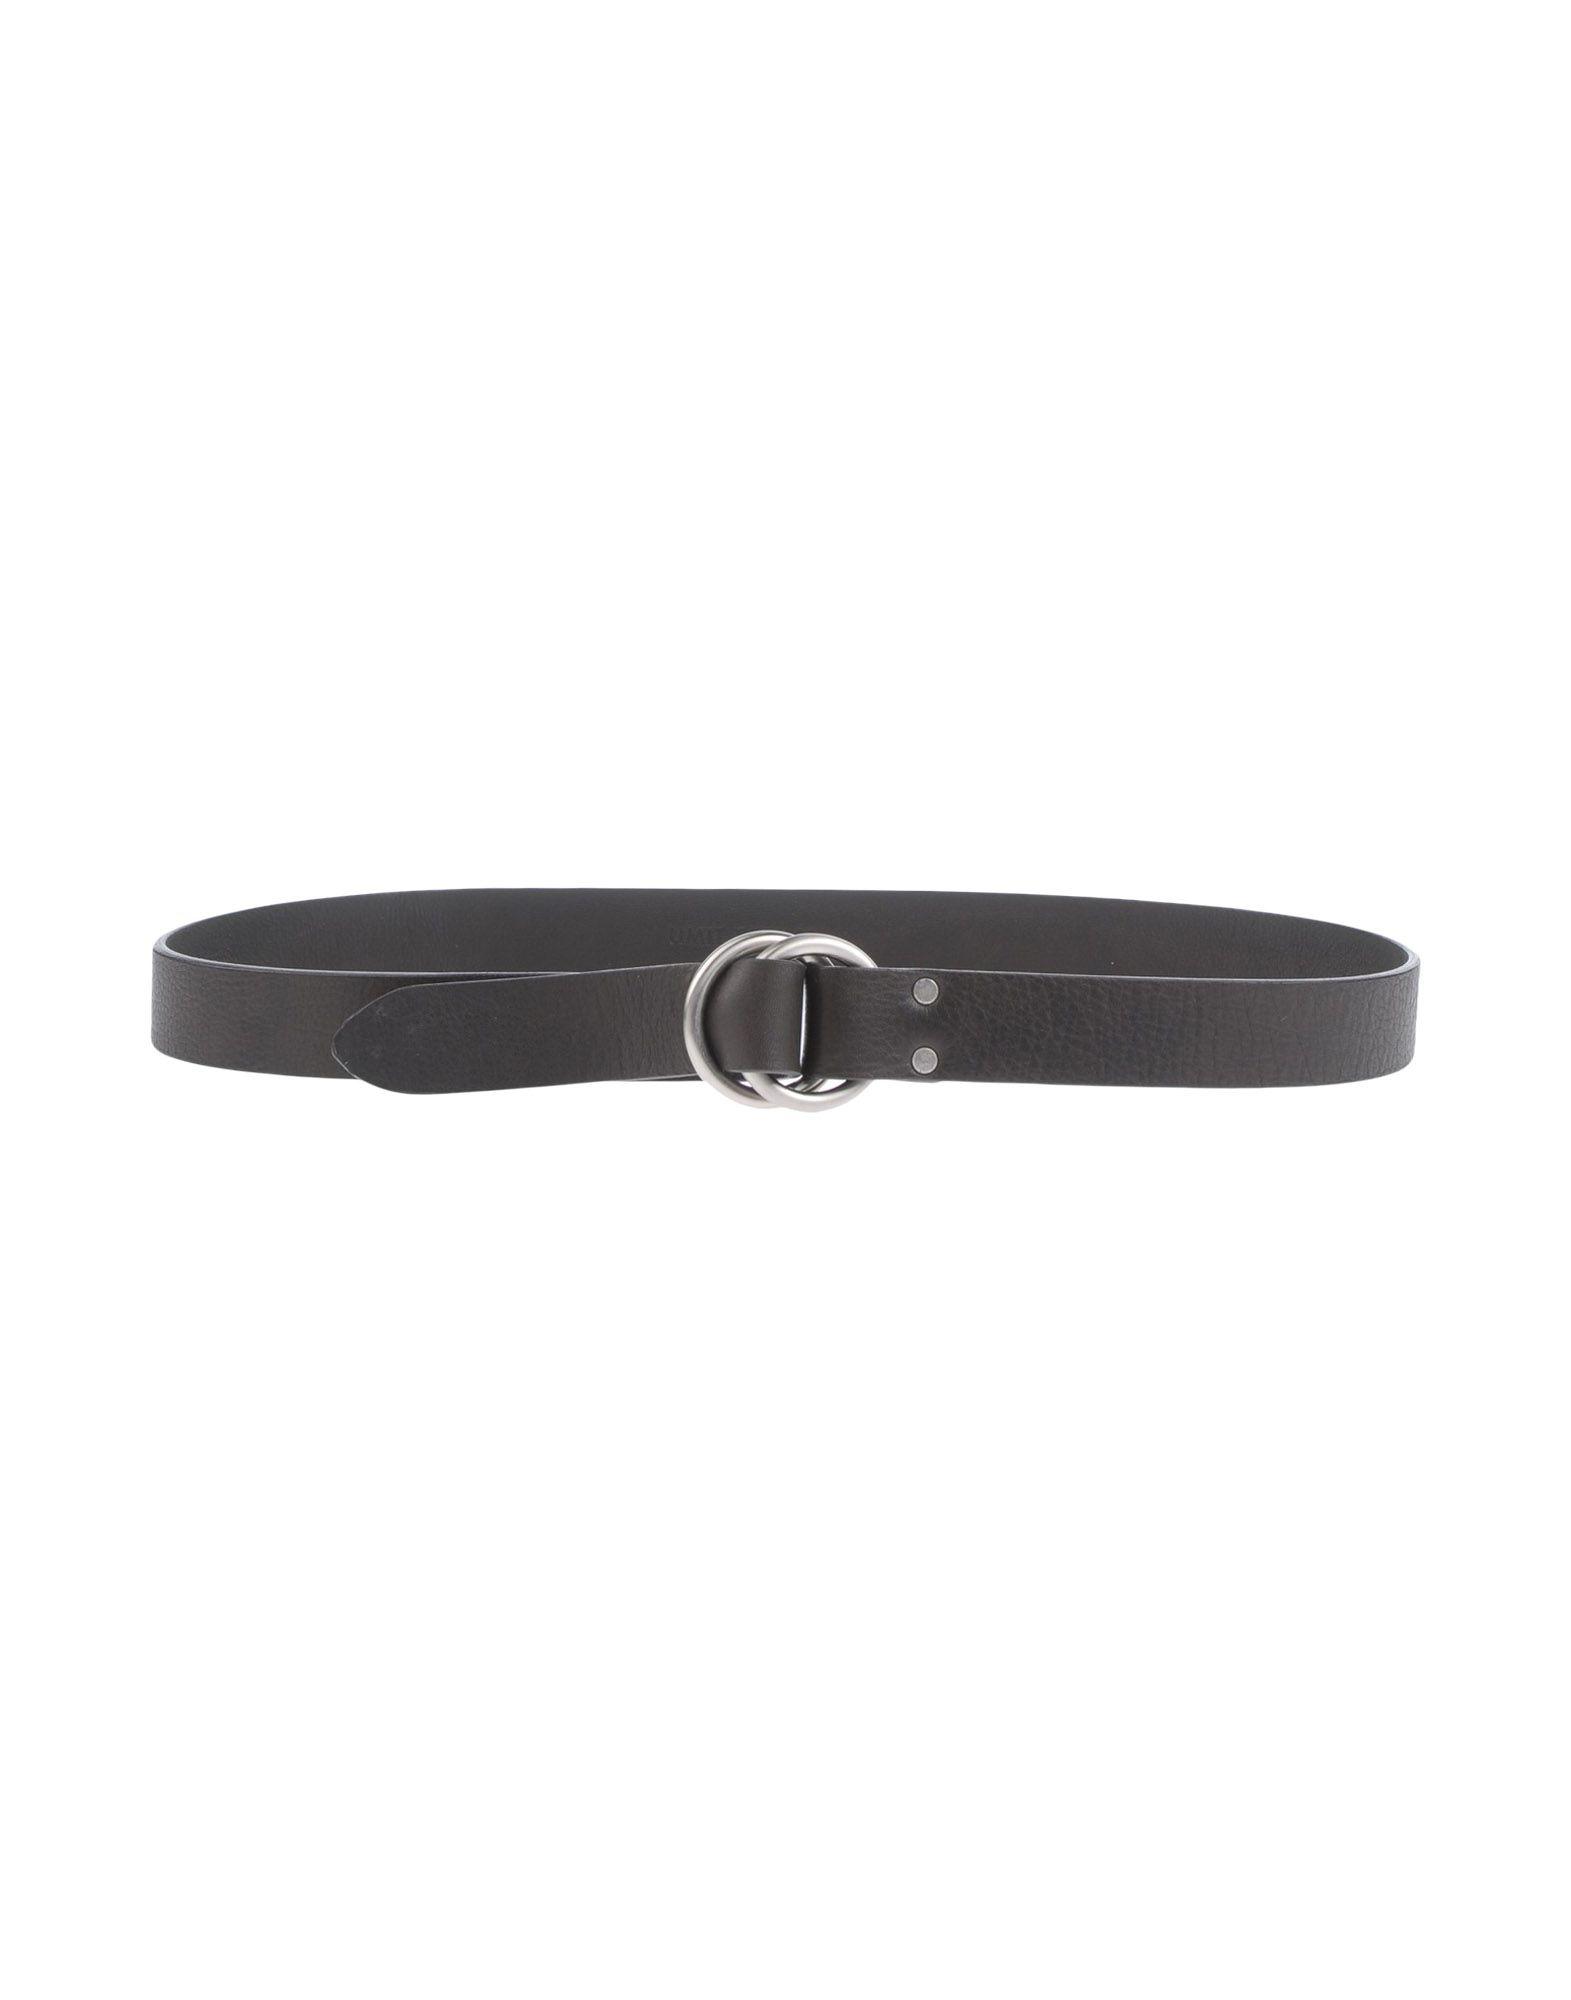 Cintura In Pelle Umit Benan Uomo - Acquista online su